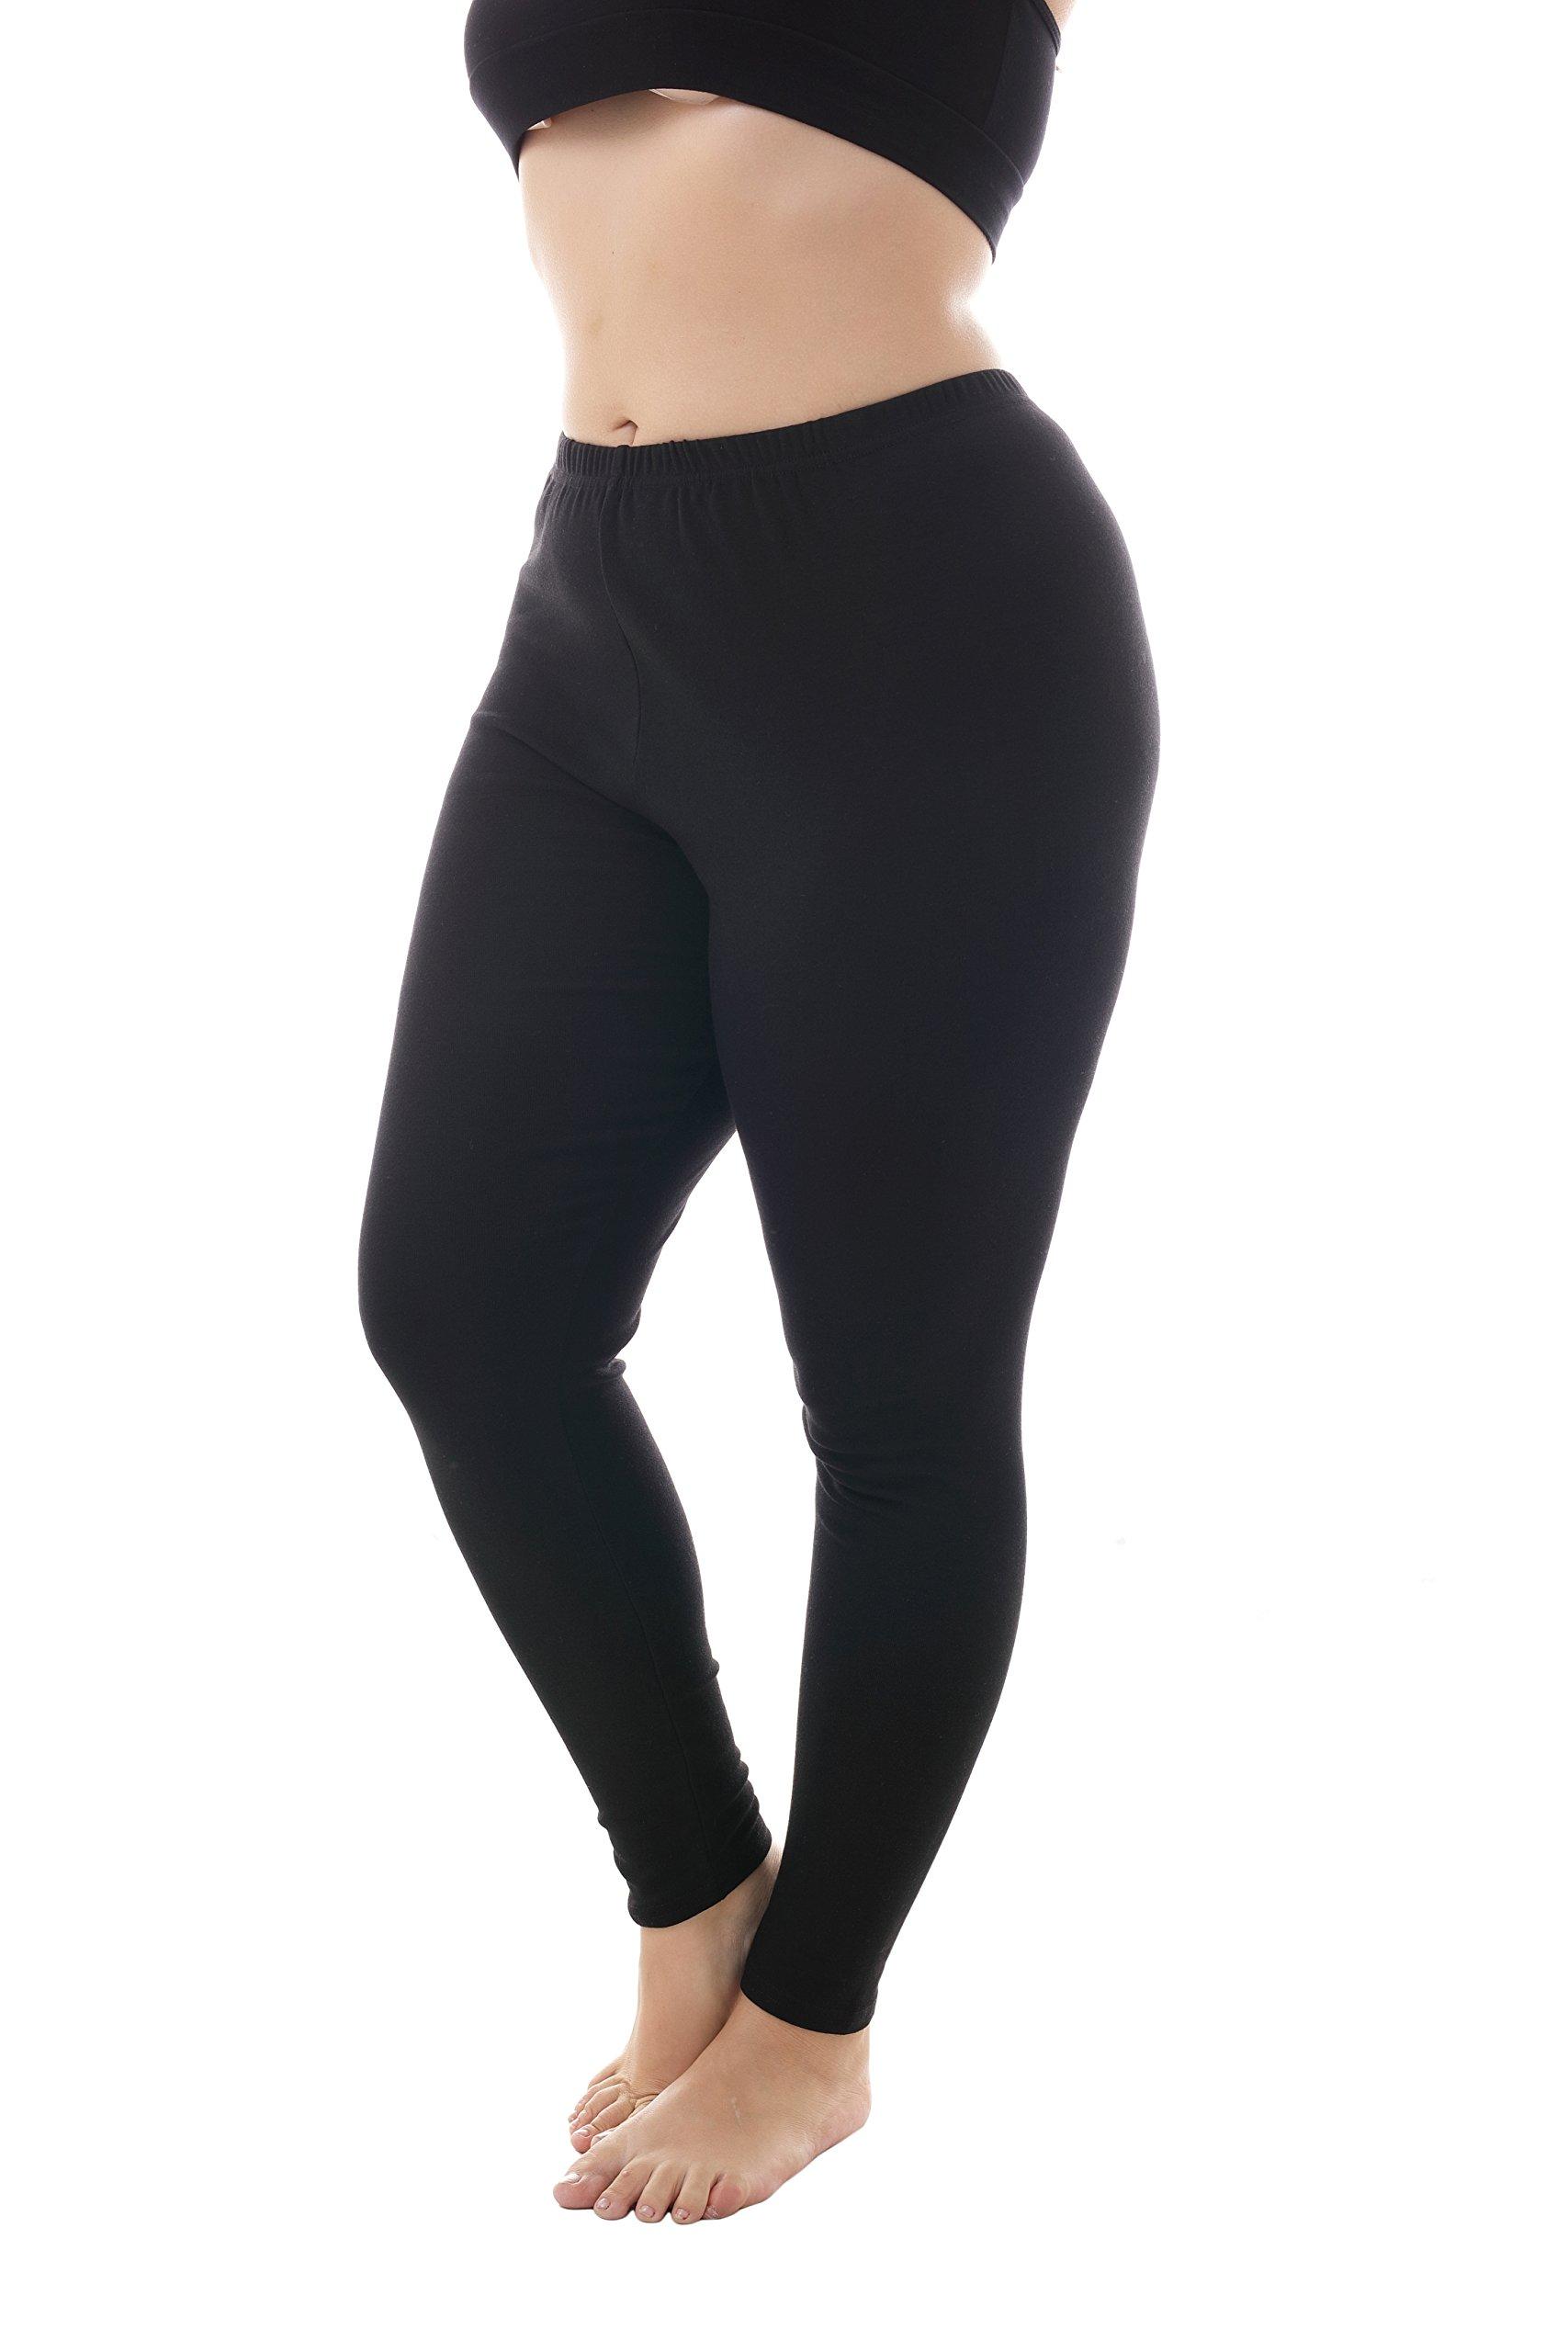 ZERDOCEAN Women's Plus Size Full Length Cotton Stetchy Leggings for Fall Black 4X